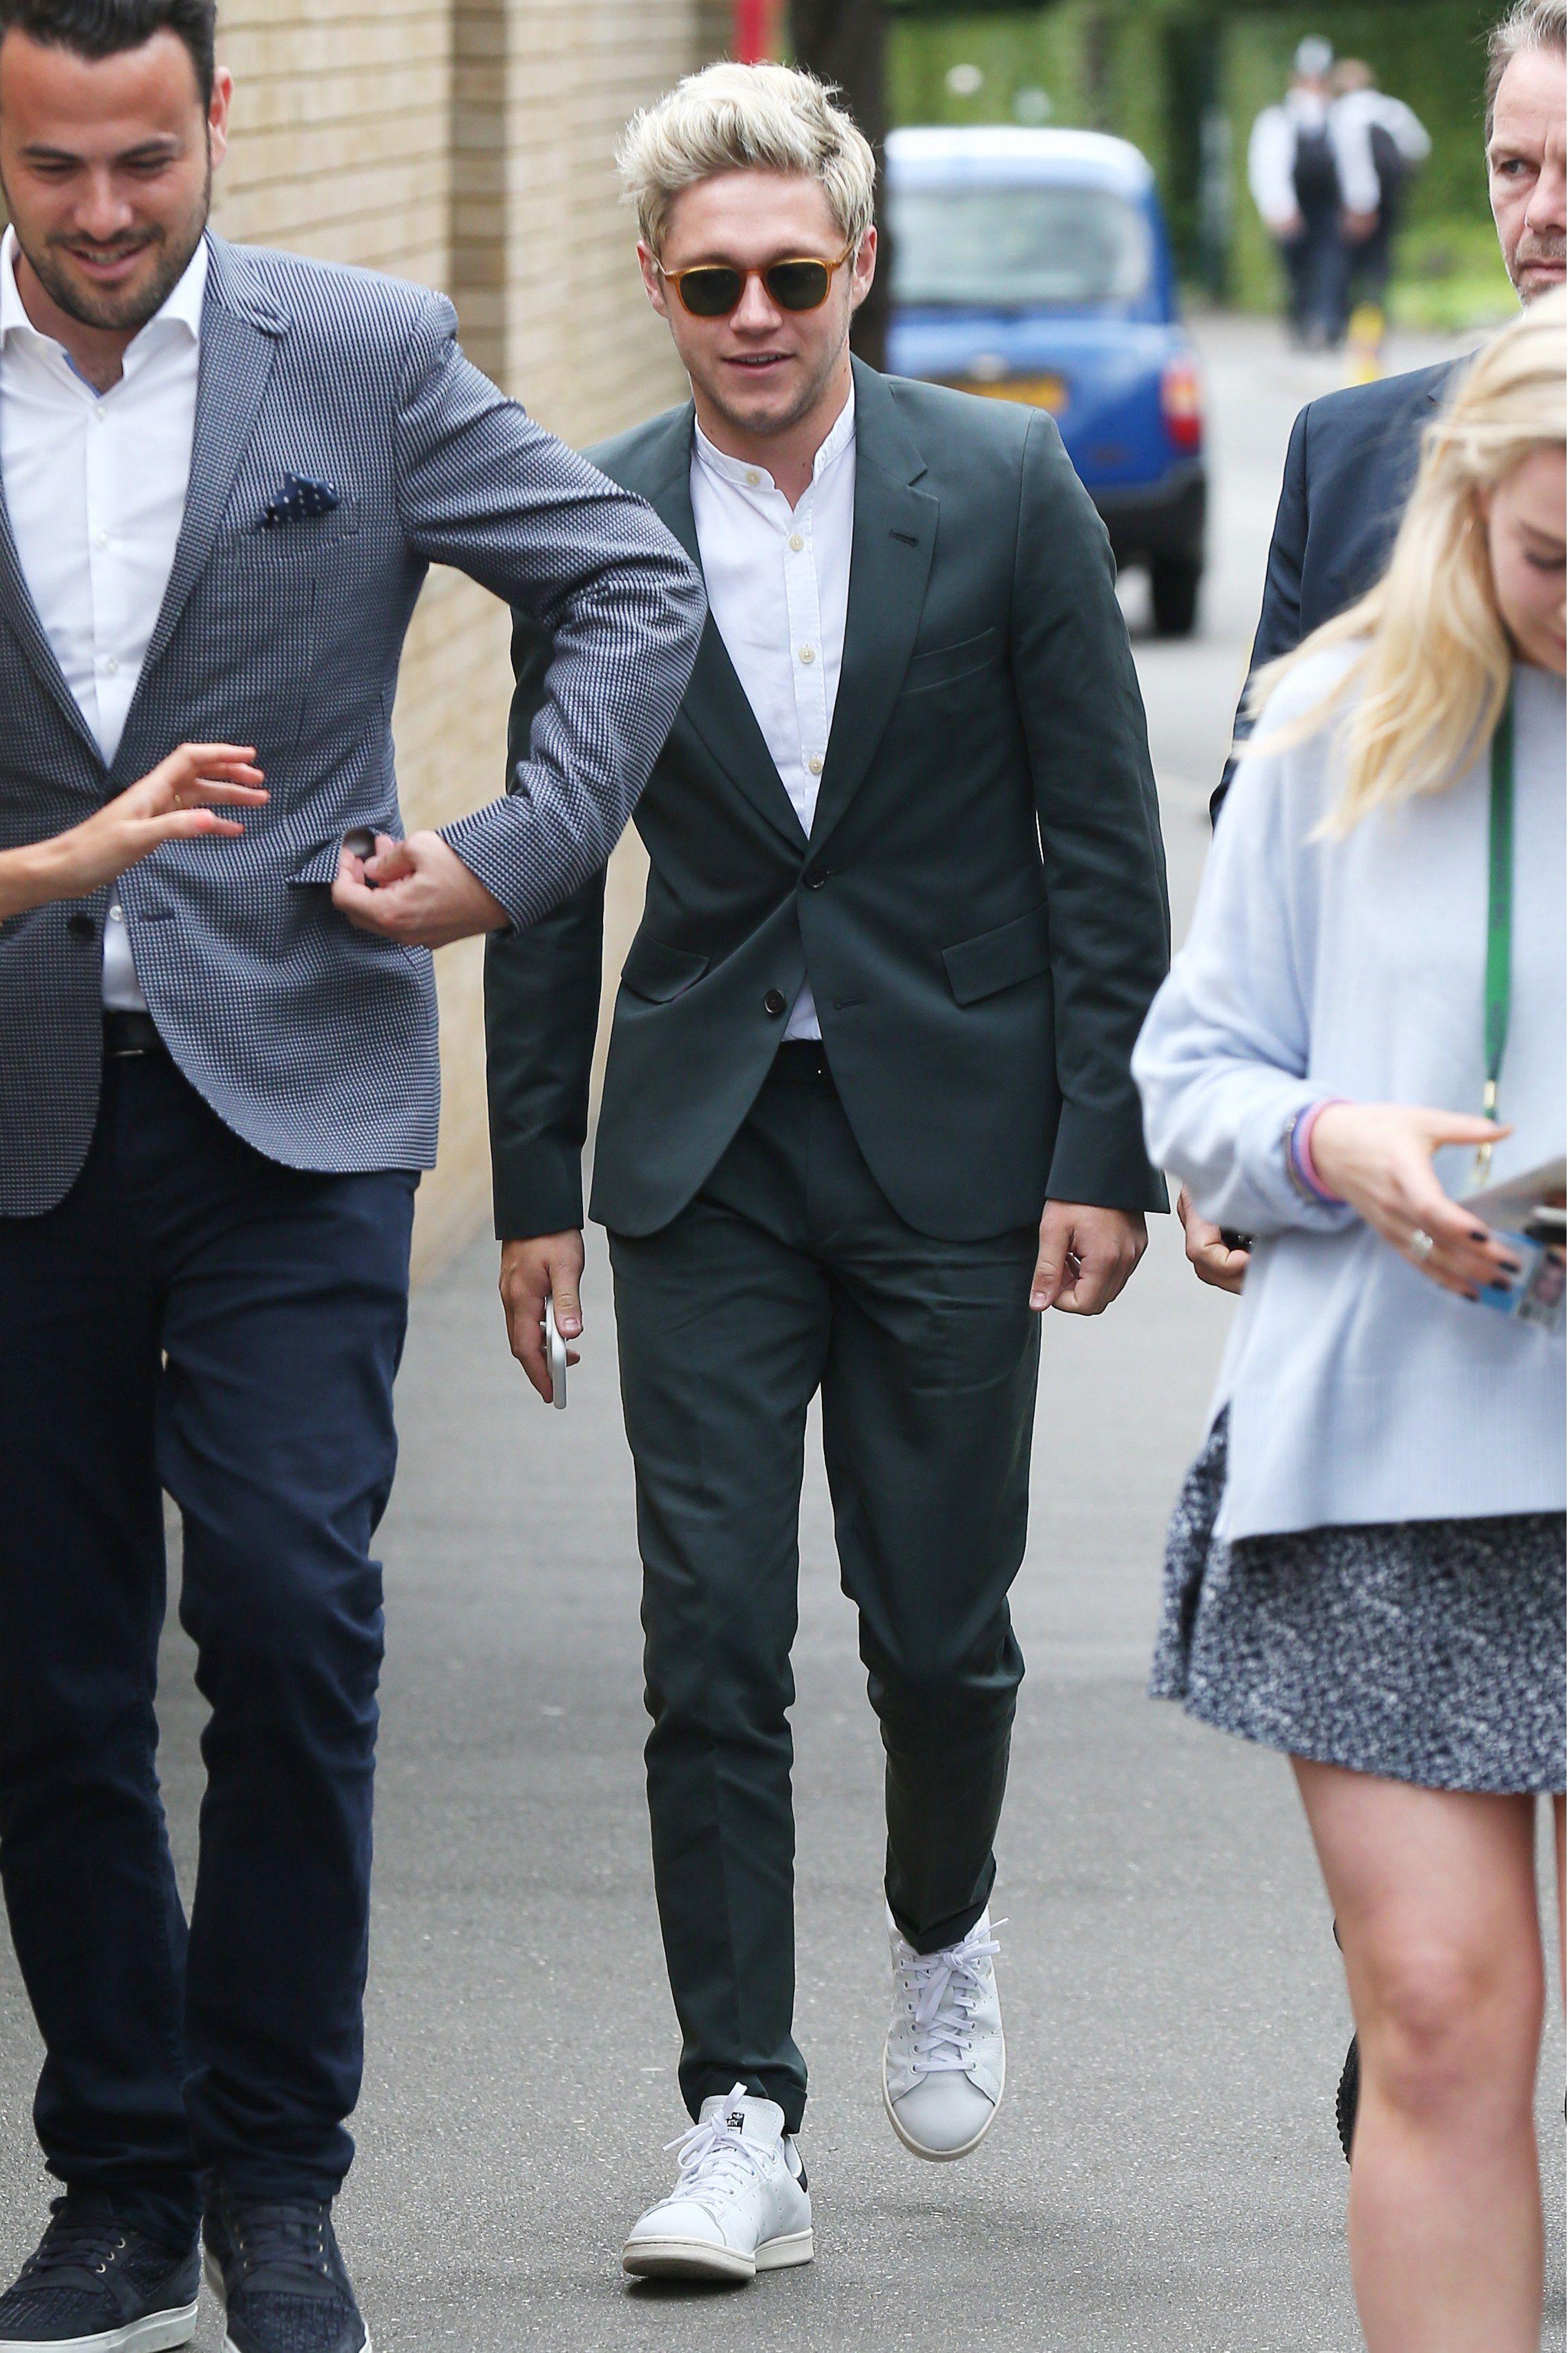 686f9e1c1d00 The Most Stylish Men at the 2016 Wimbledon Tournament | Stuntin Is A ...